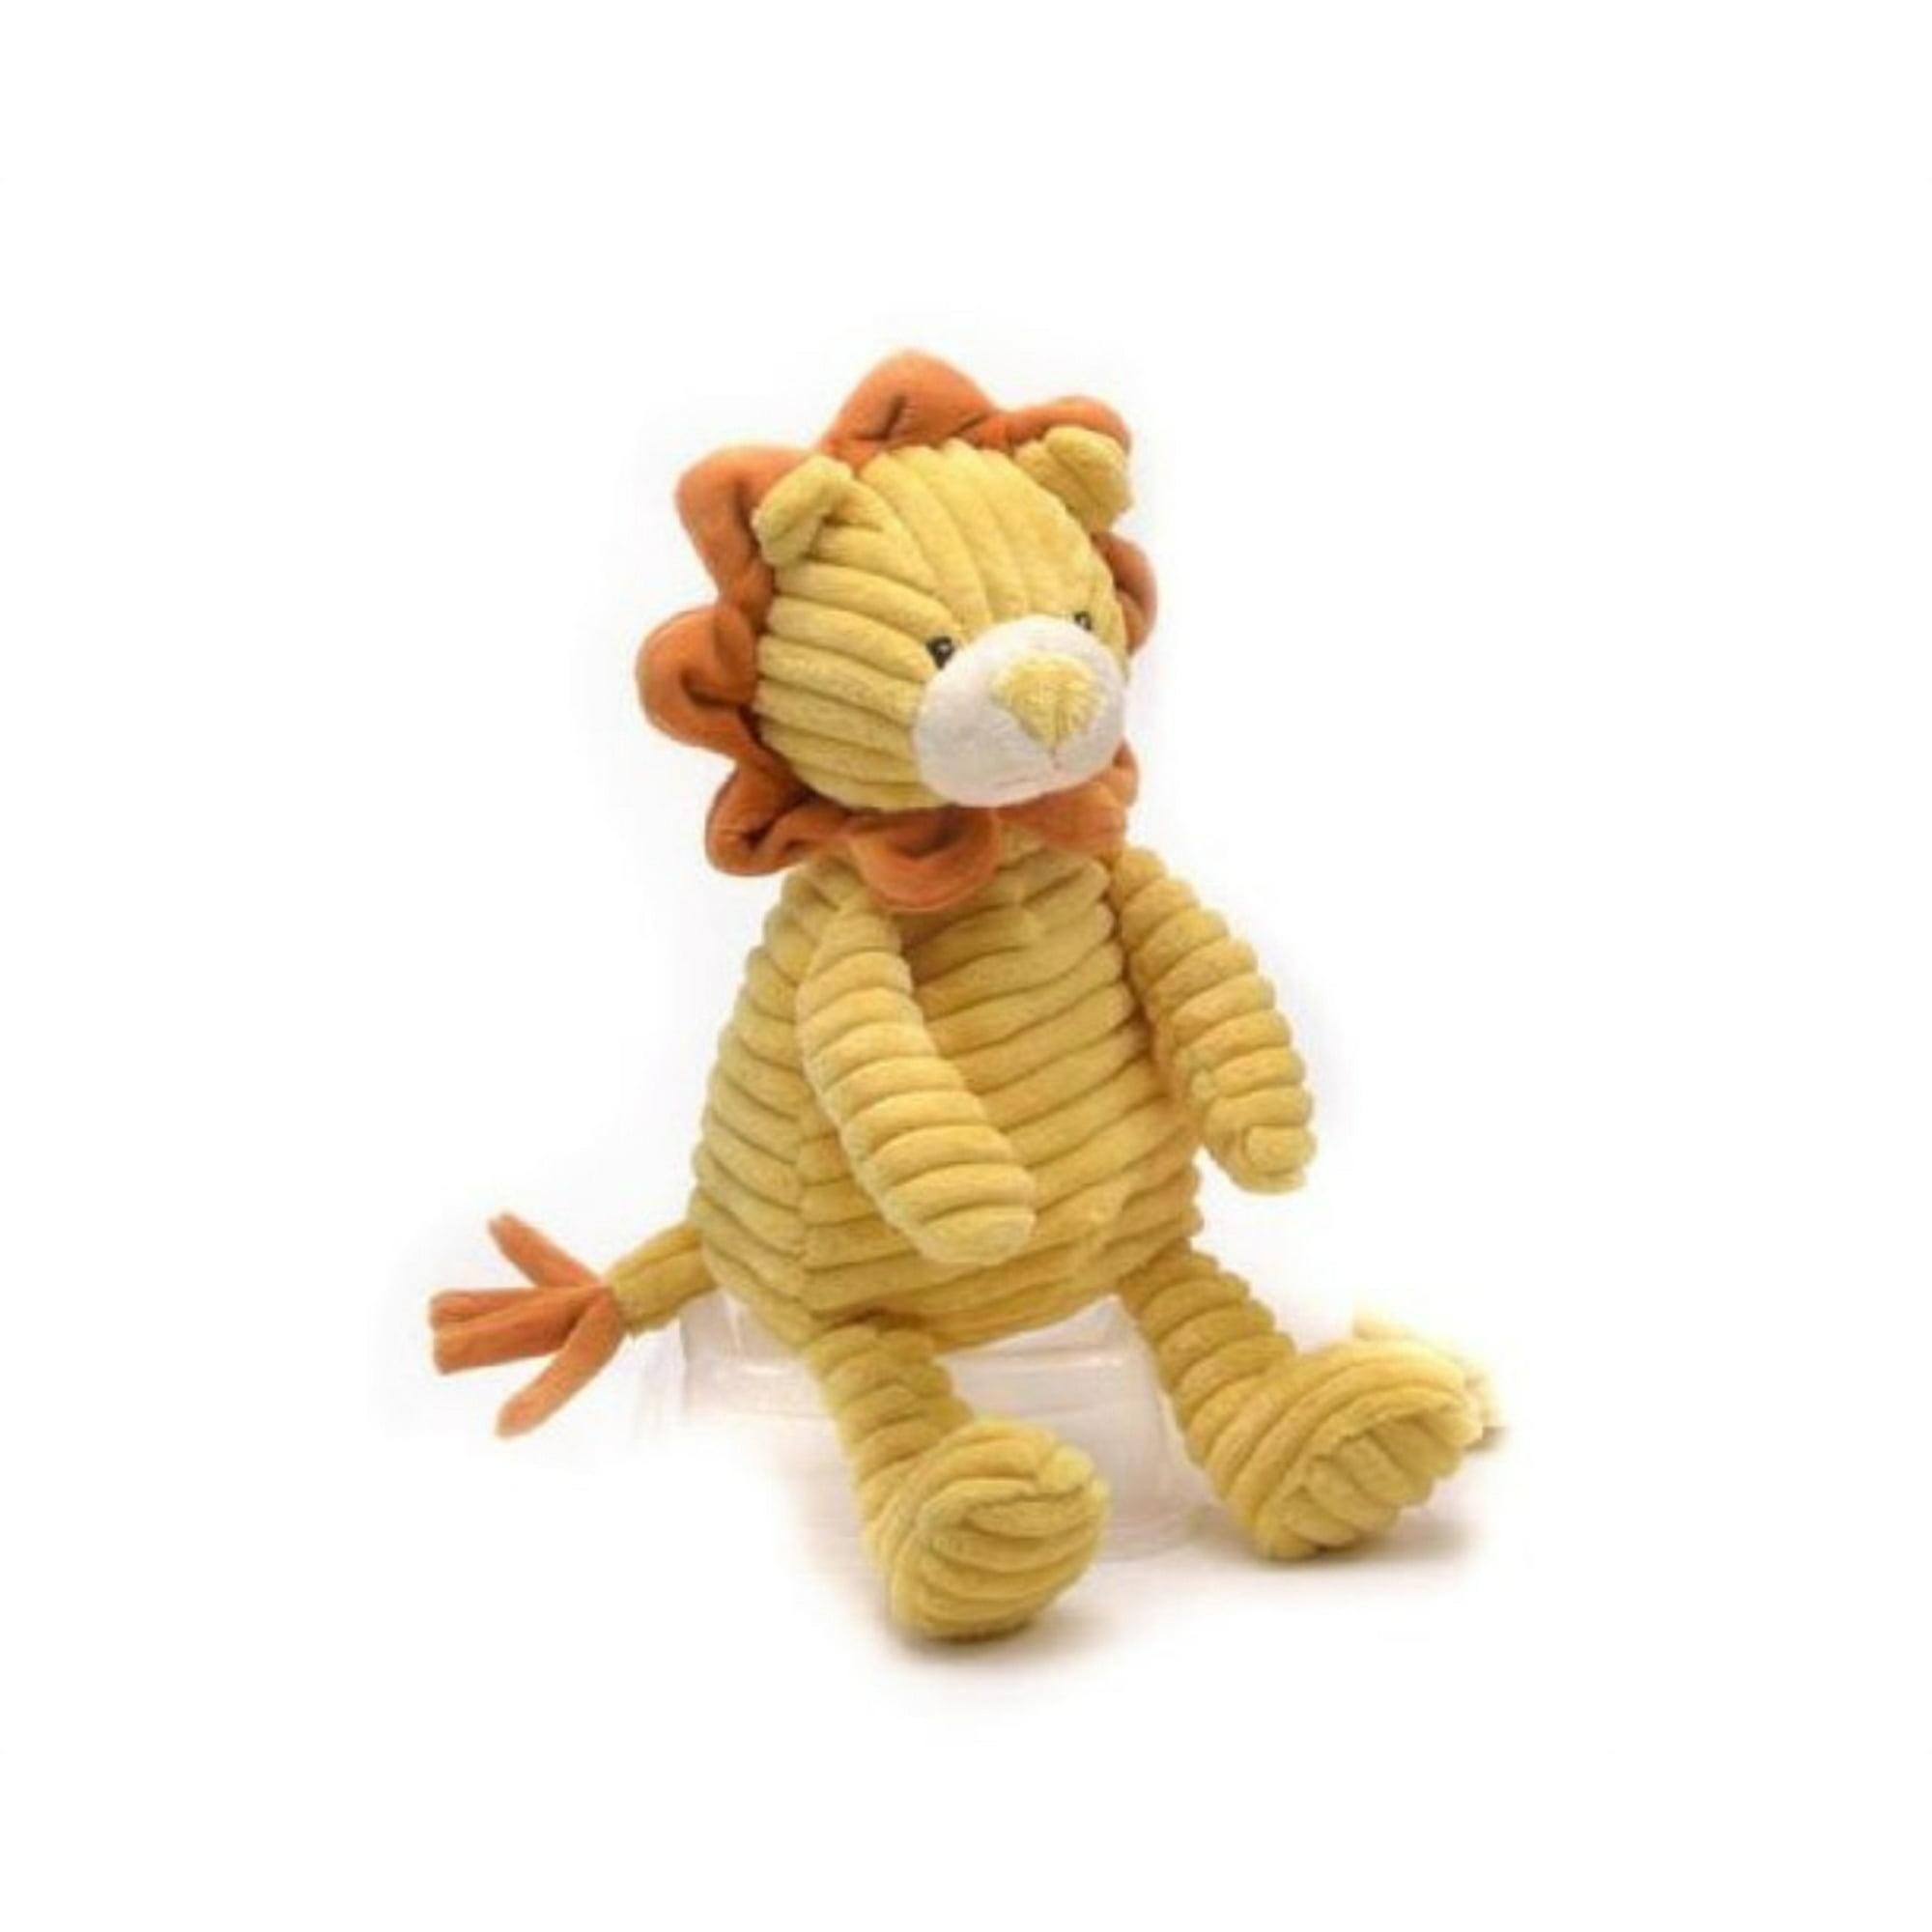 Teddy Bear Stuffed Toy, Kordy Lion Jr 14 By Unipak Walmart Canada